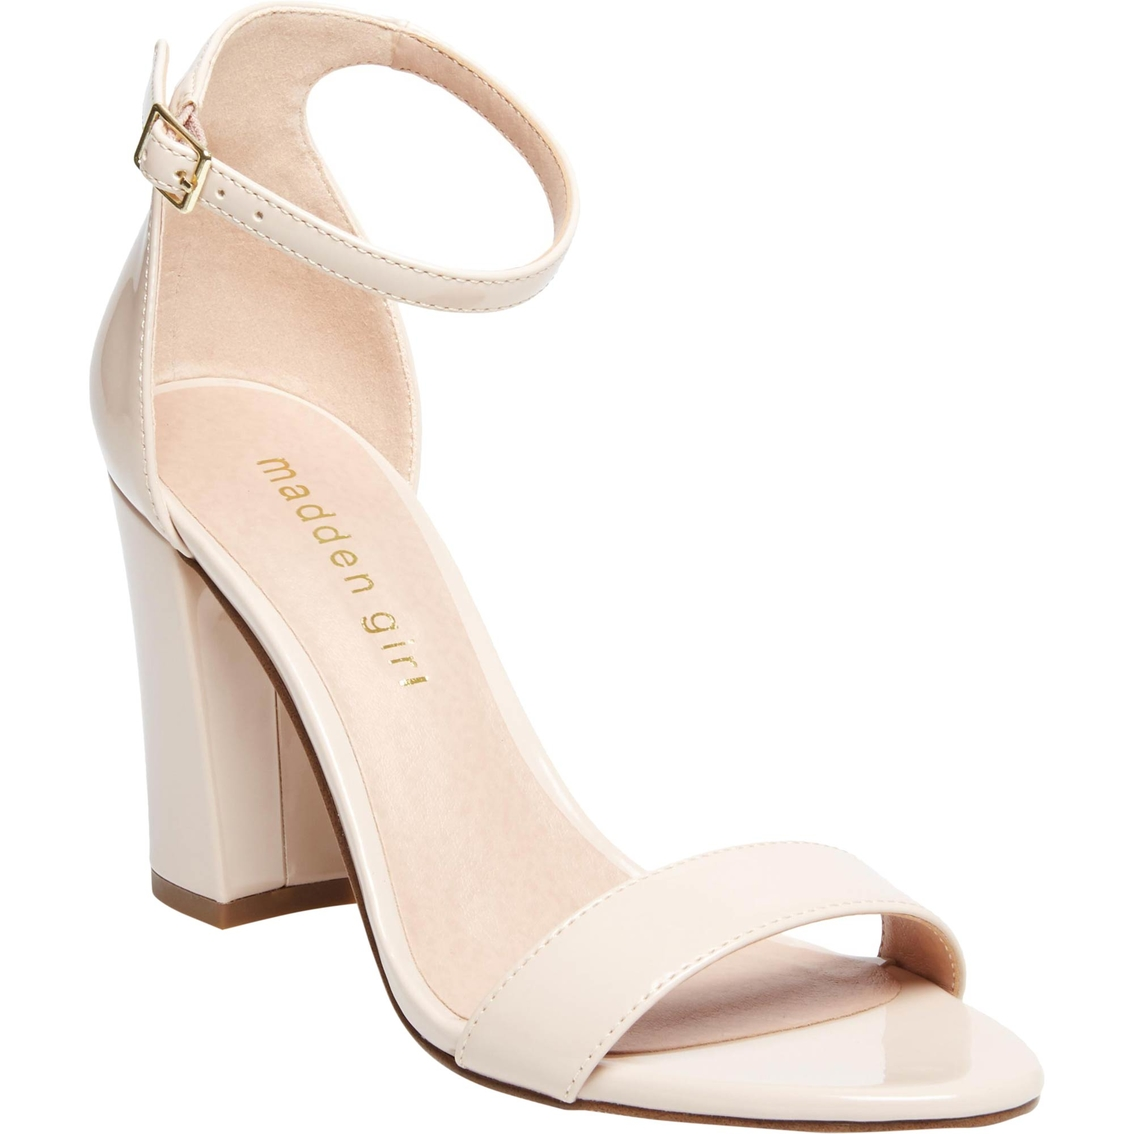 Madden Girl Beella Dress Sandals